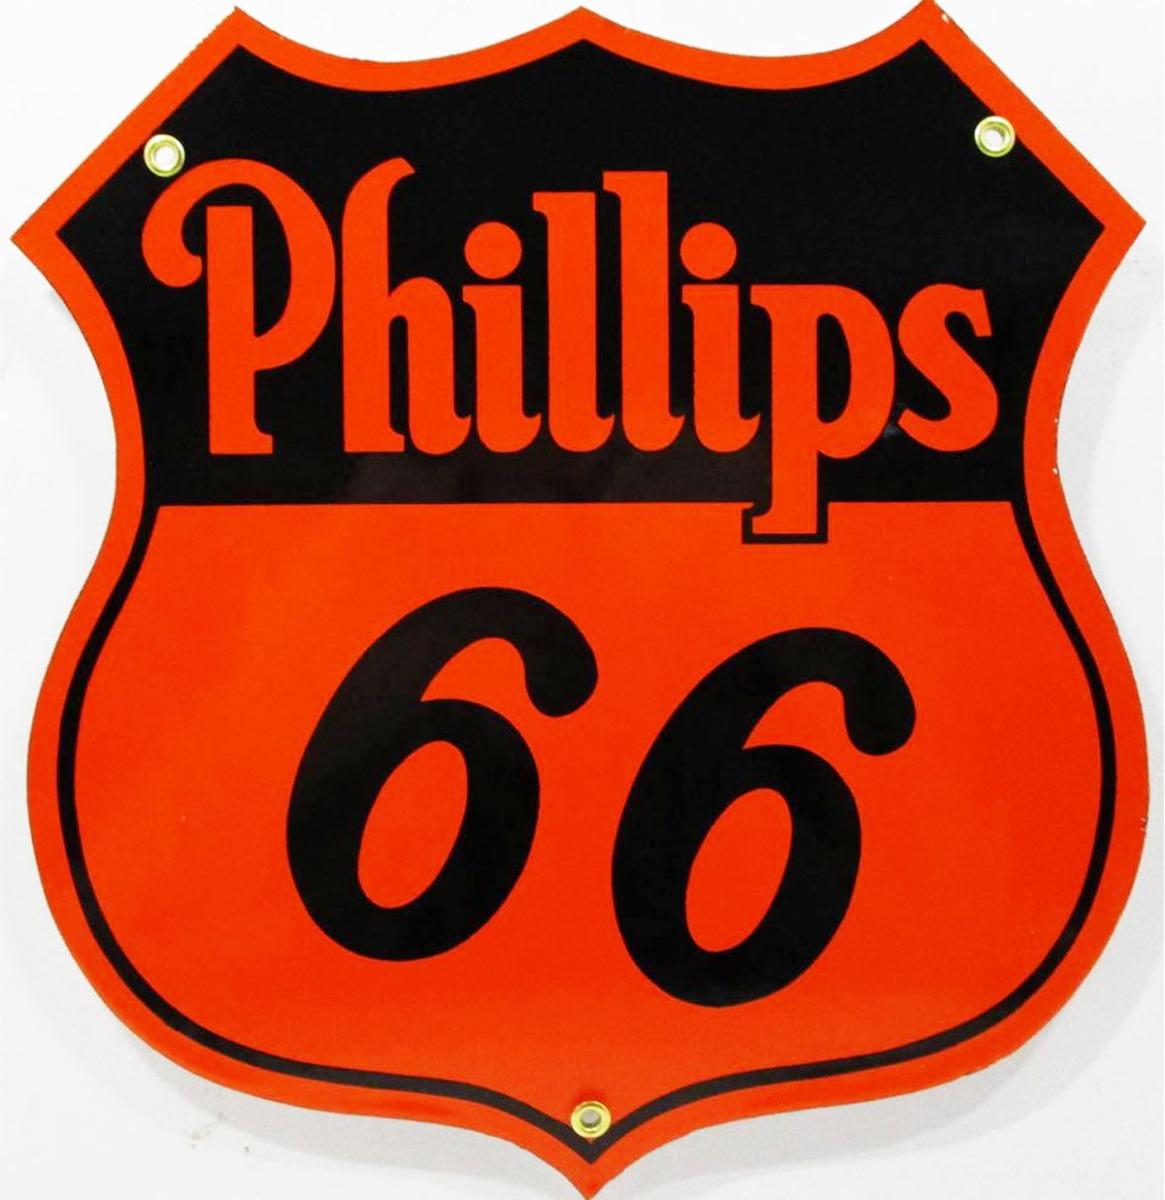 Phillips 66 Oranje Logo Emaille Bord 30 x 28 cm